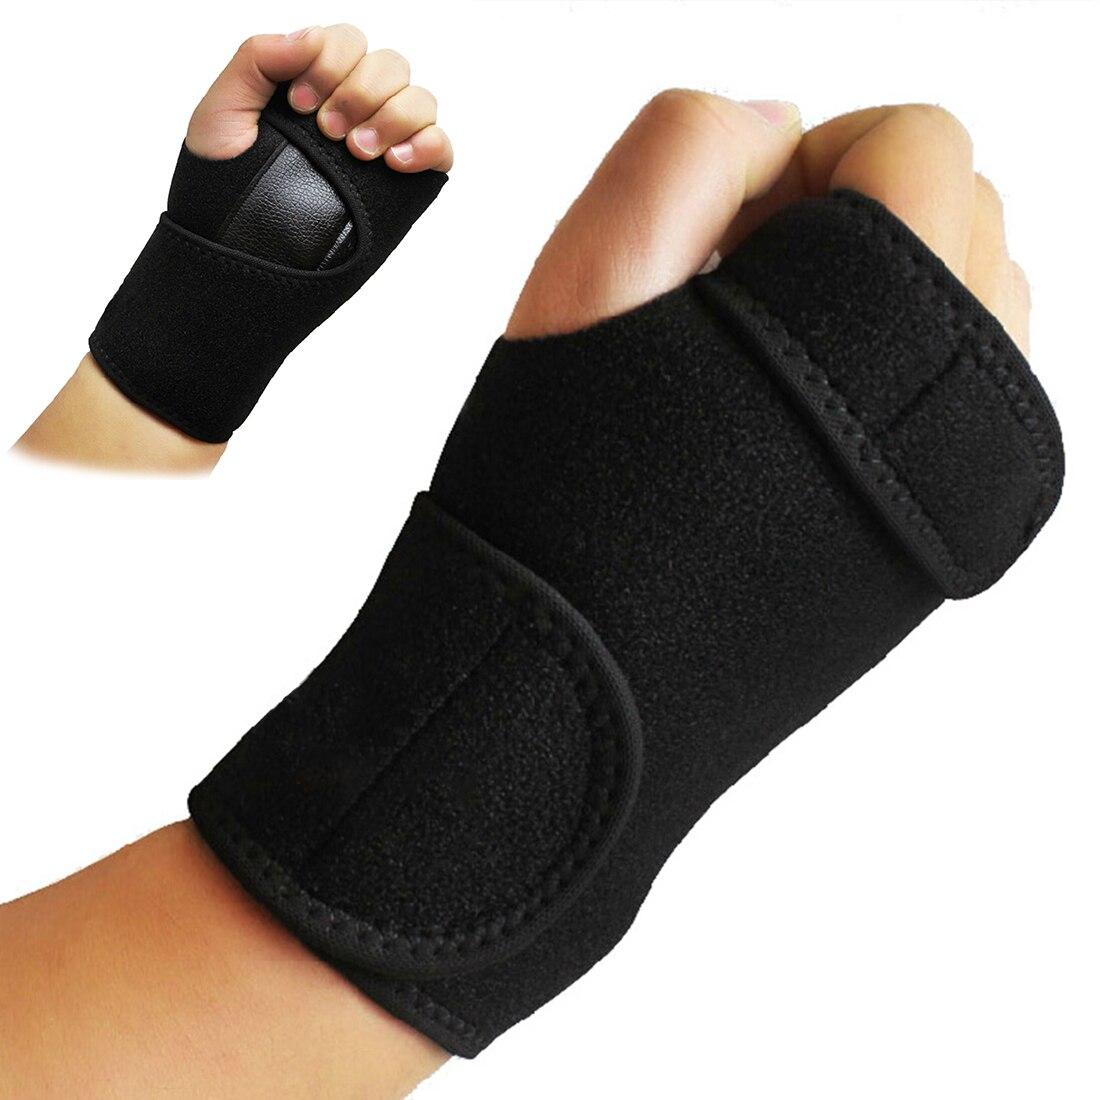 Wristband New Bandage Orthopedic Hand Brace Wrist Support Finger Splint Carpal Tunnel Syndrome